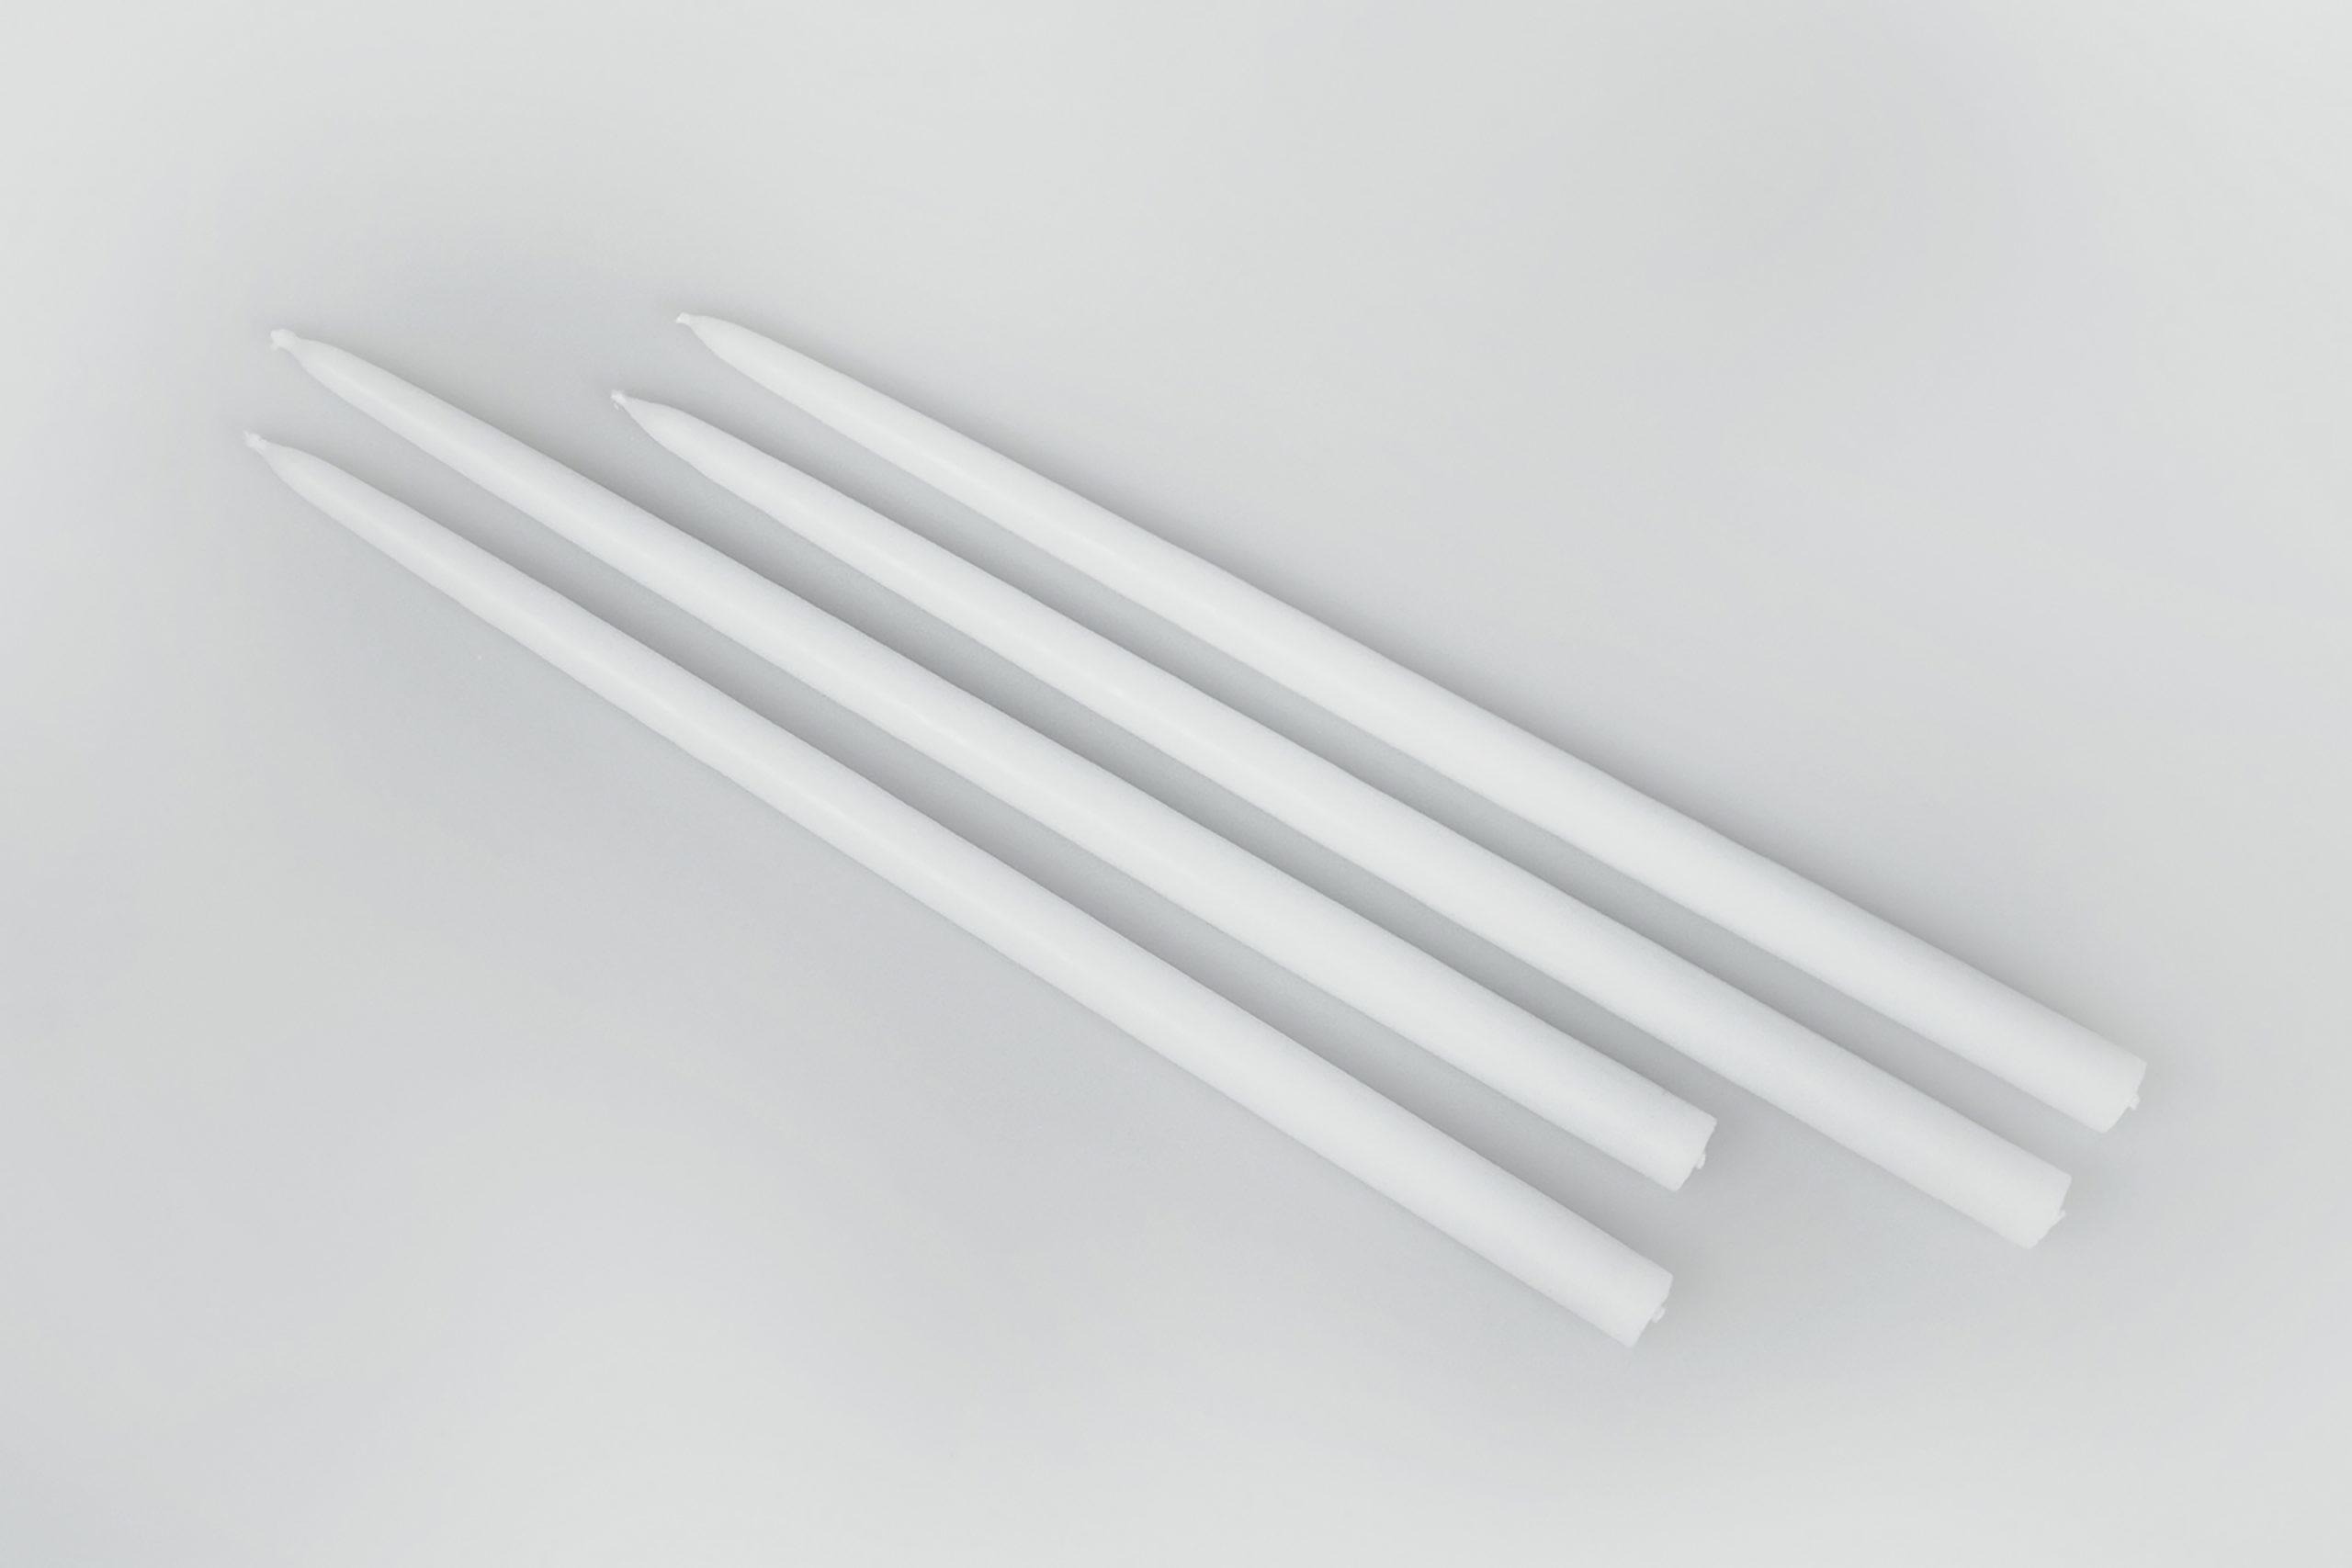 Architectmade-Candels-for-Gemini-White-Wax-Peter-Karpf